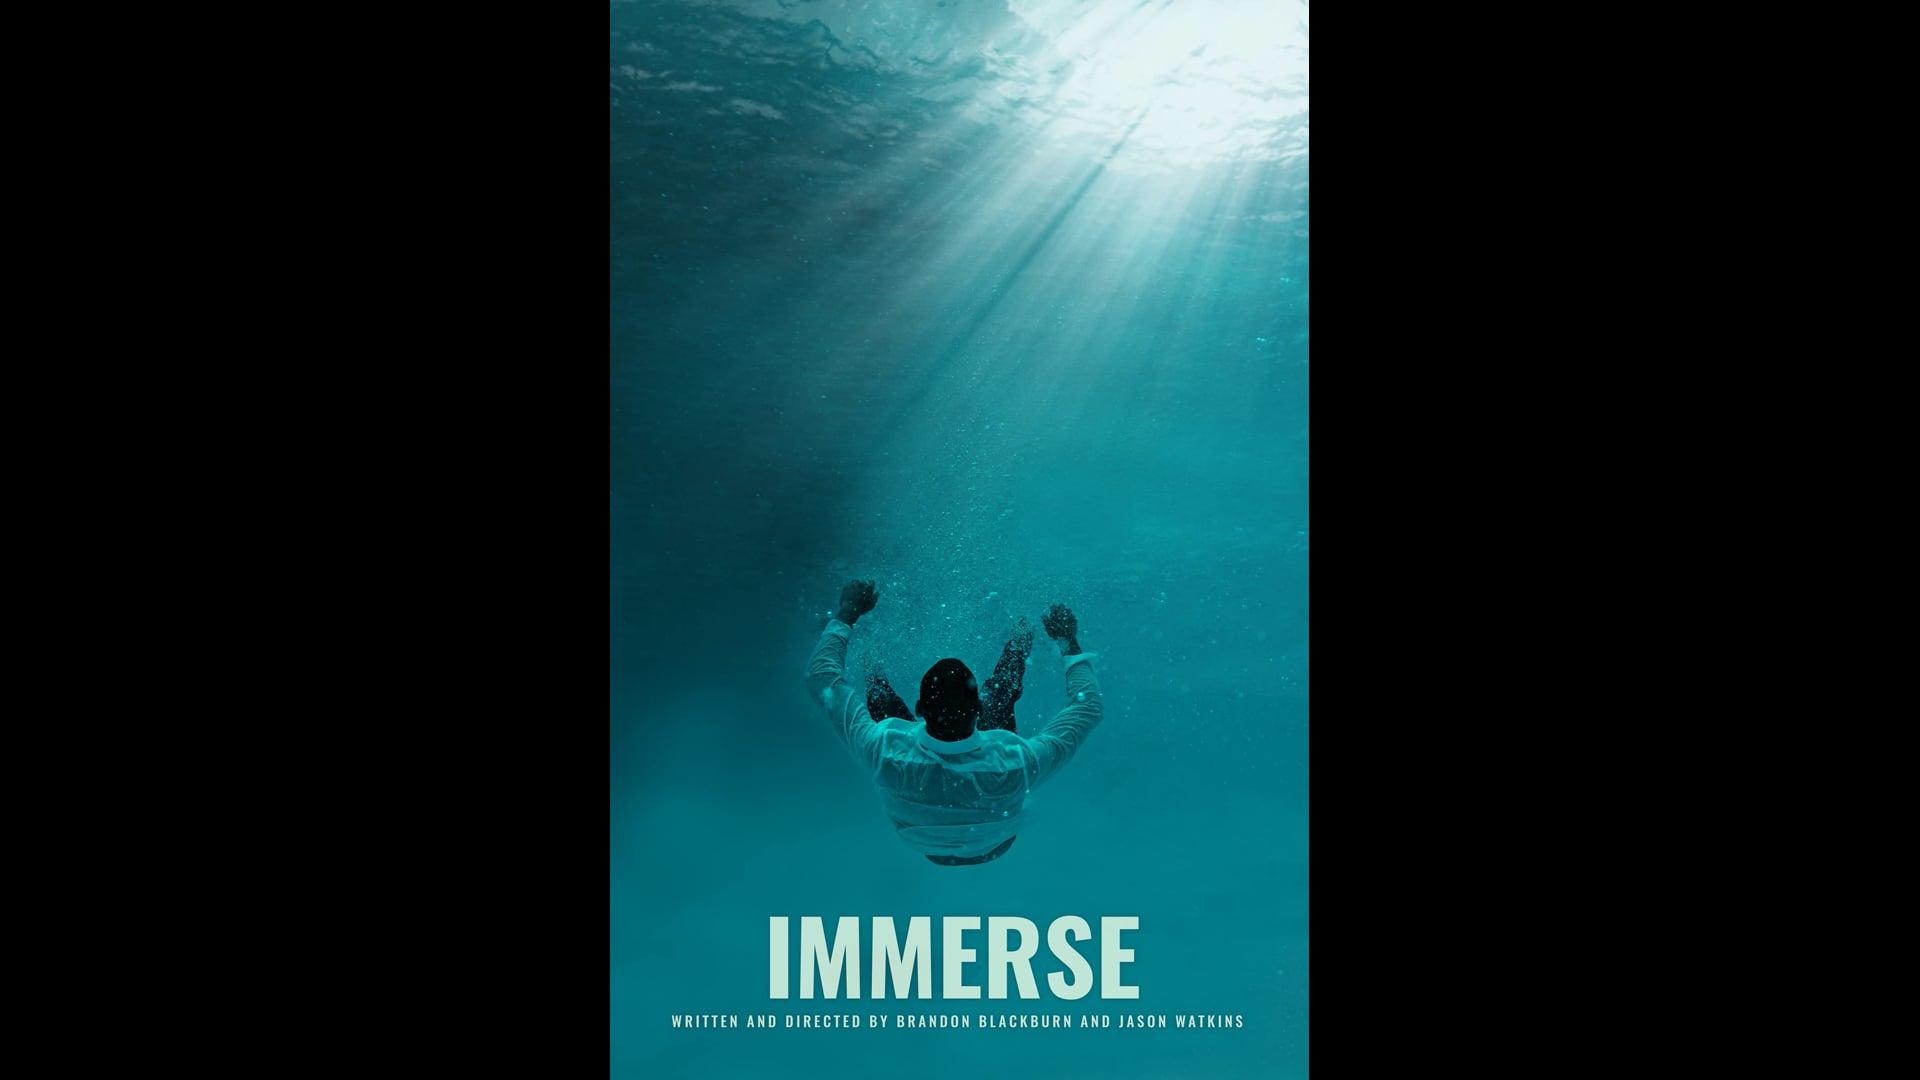 Immerse – Trailer